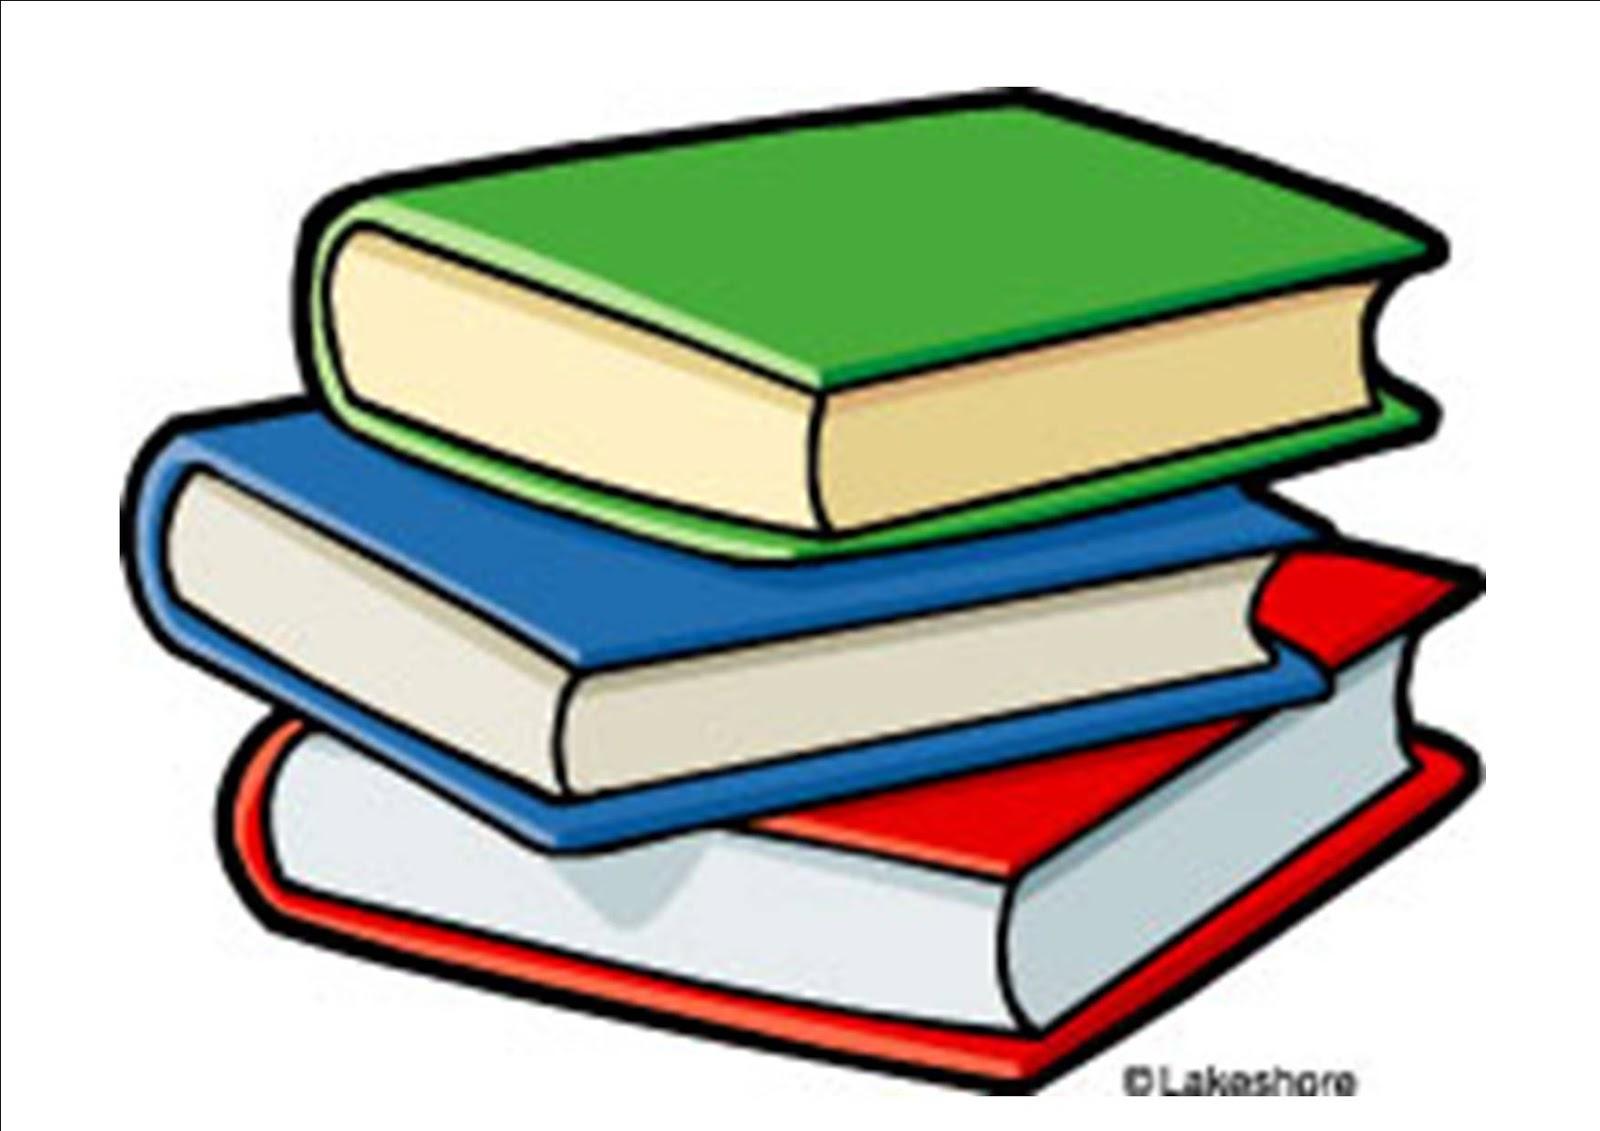 Teacher Books Clipart #125.